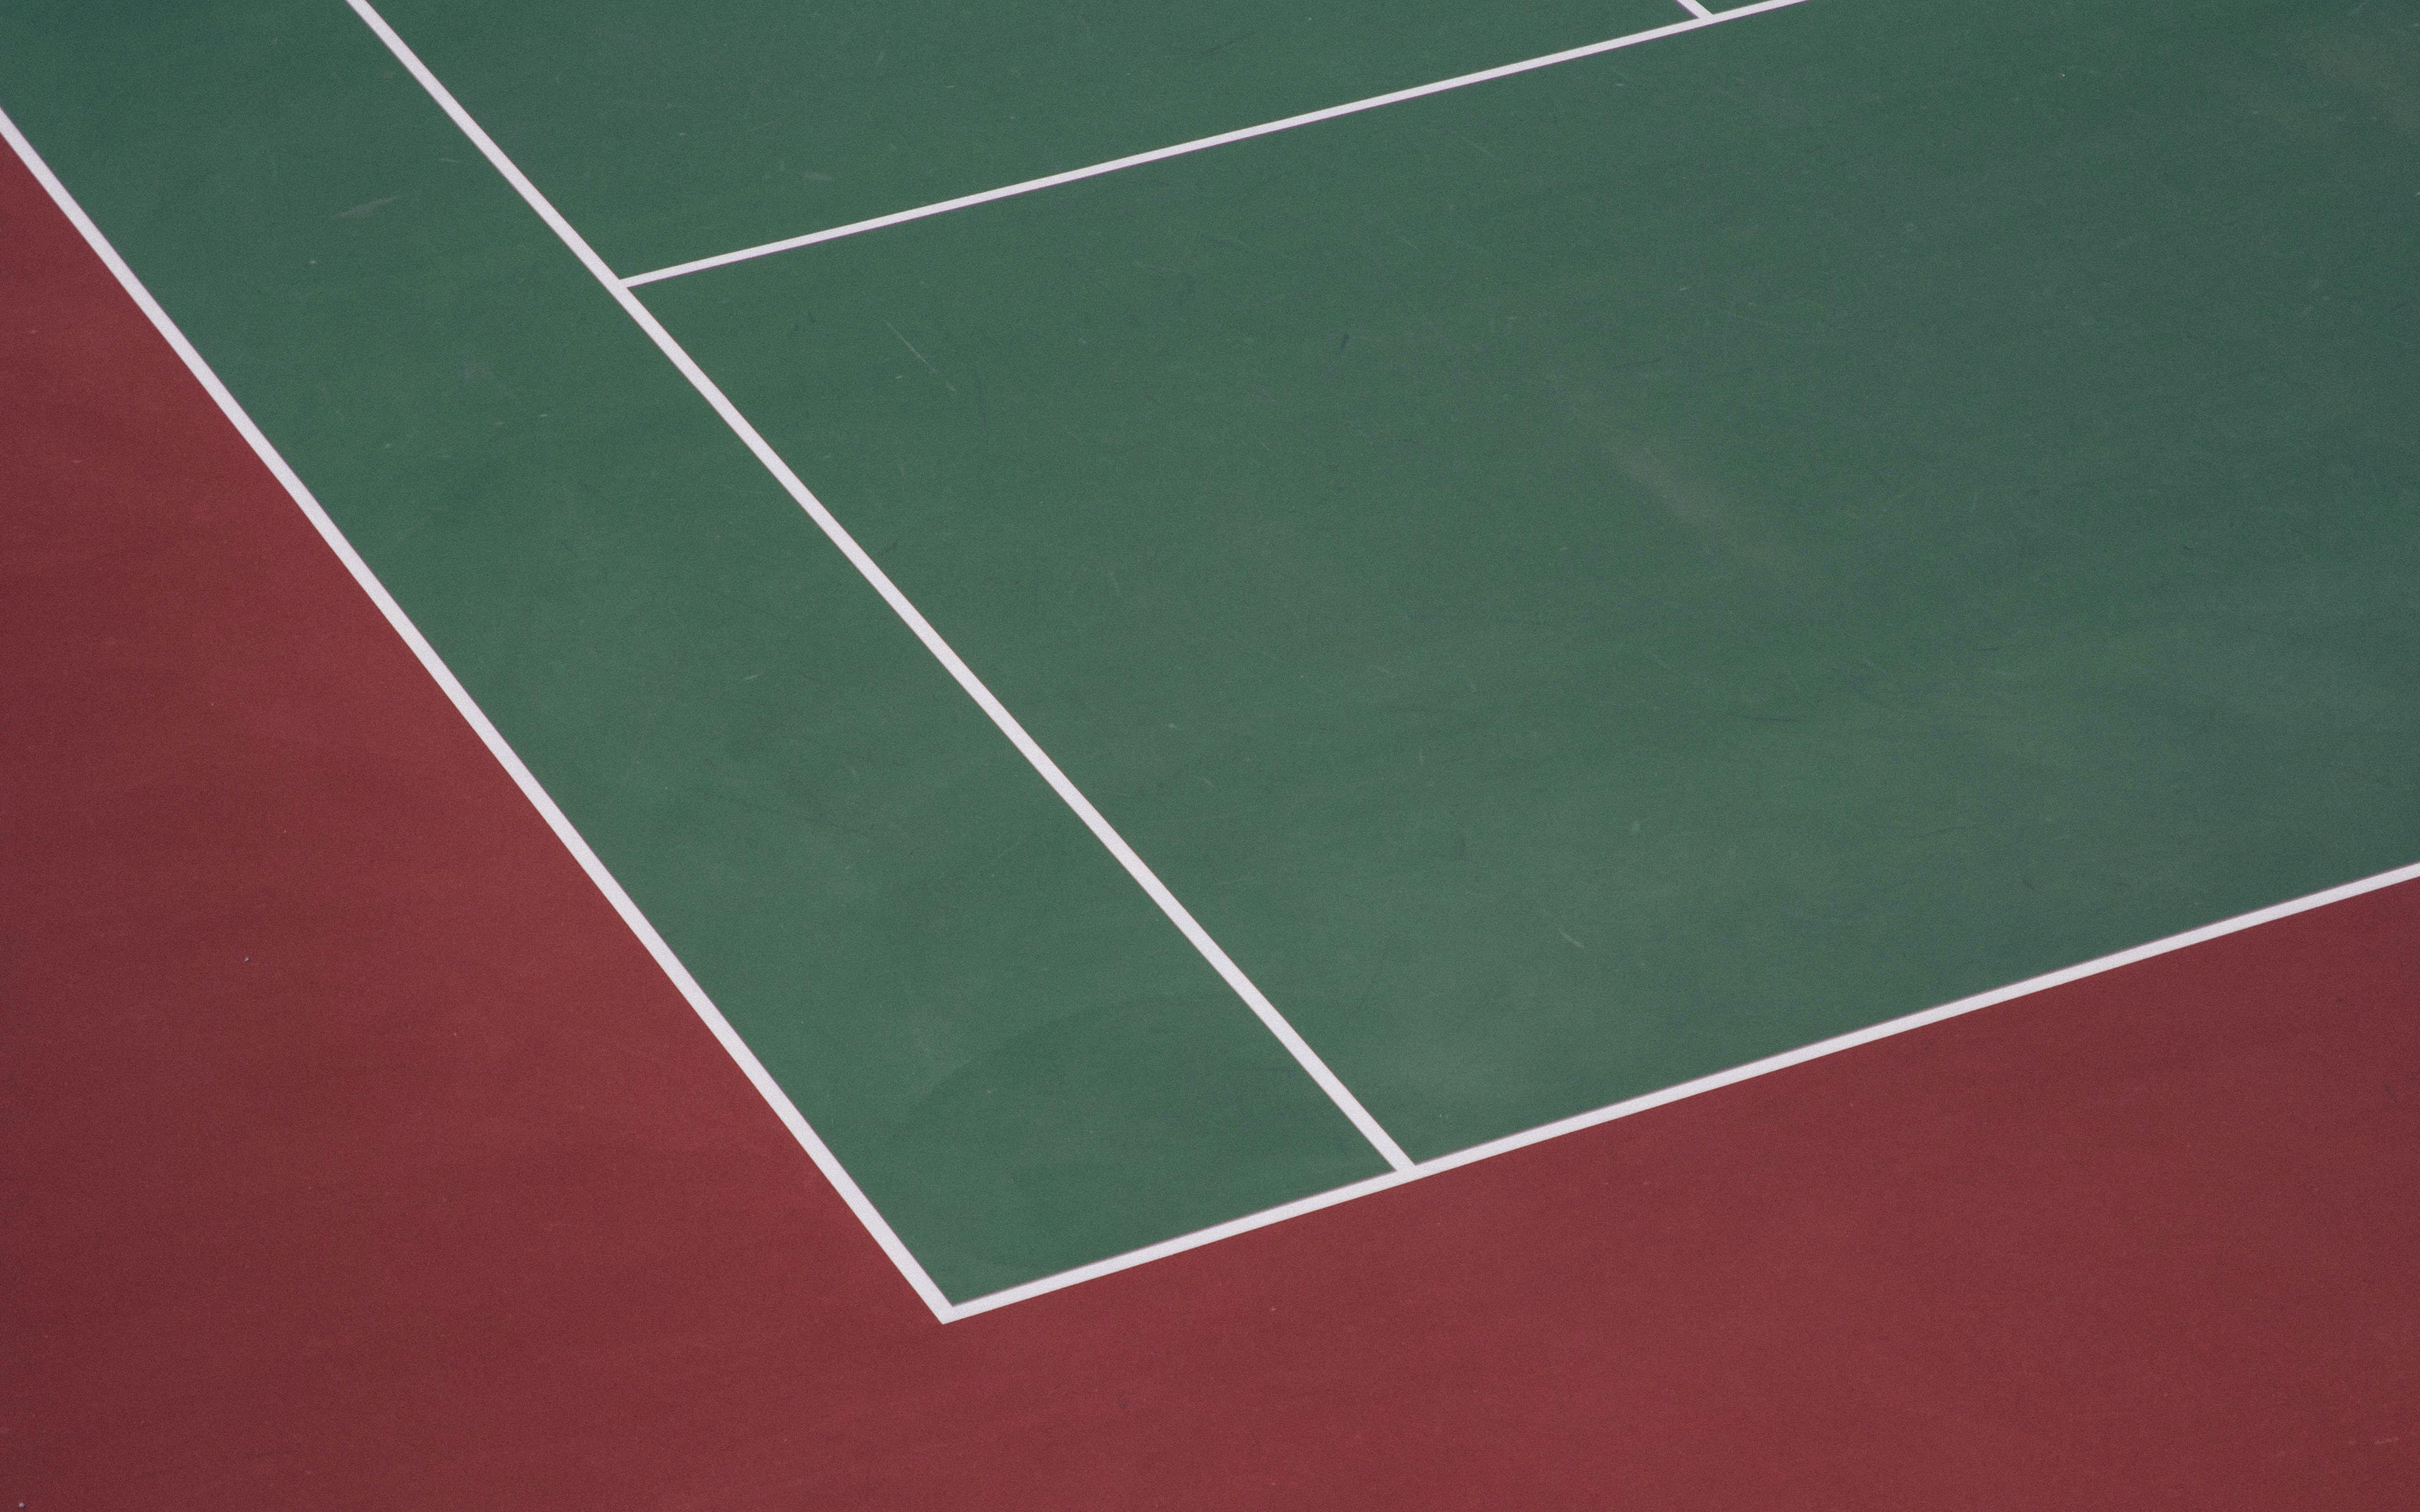 Gaithersburg Tennis Court Photo By Chris Chondrogiannis Cchondro